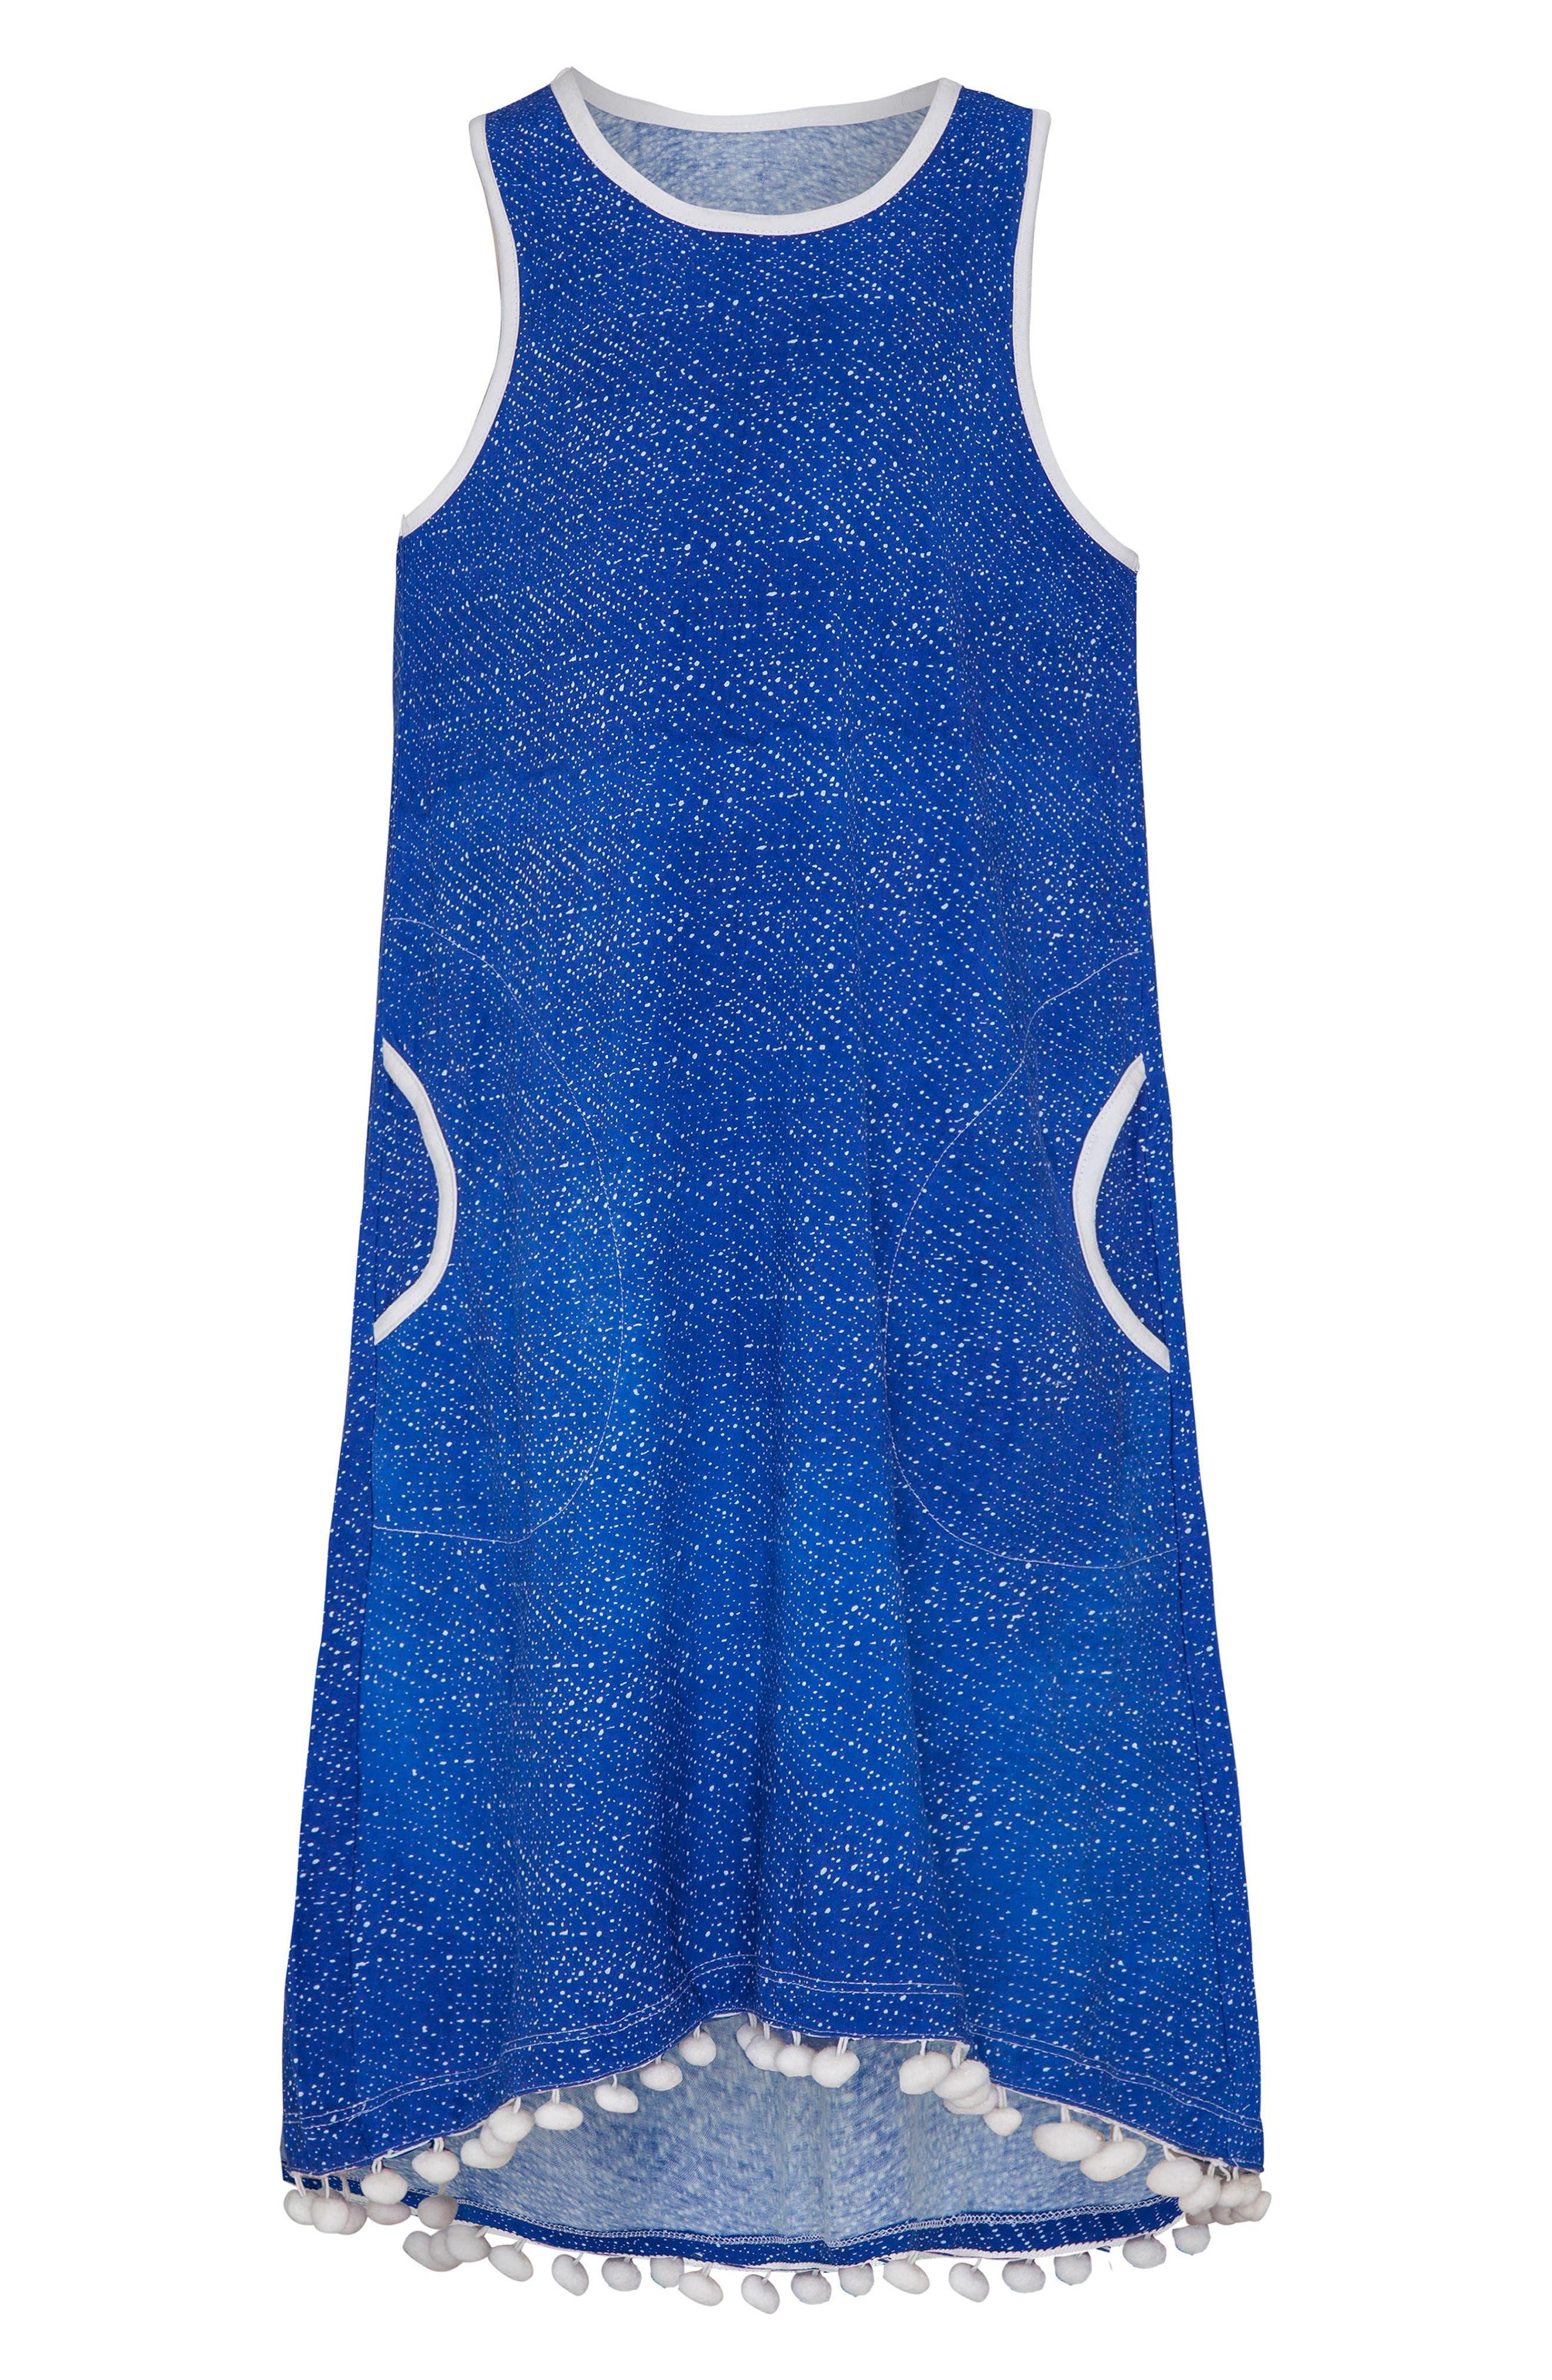 Main Image - Platypus Australia Print Cover-Up Dress (Big Girls)